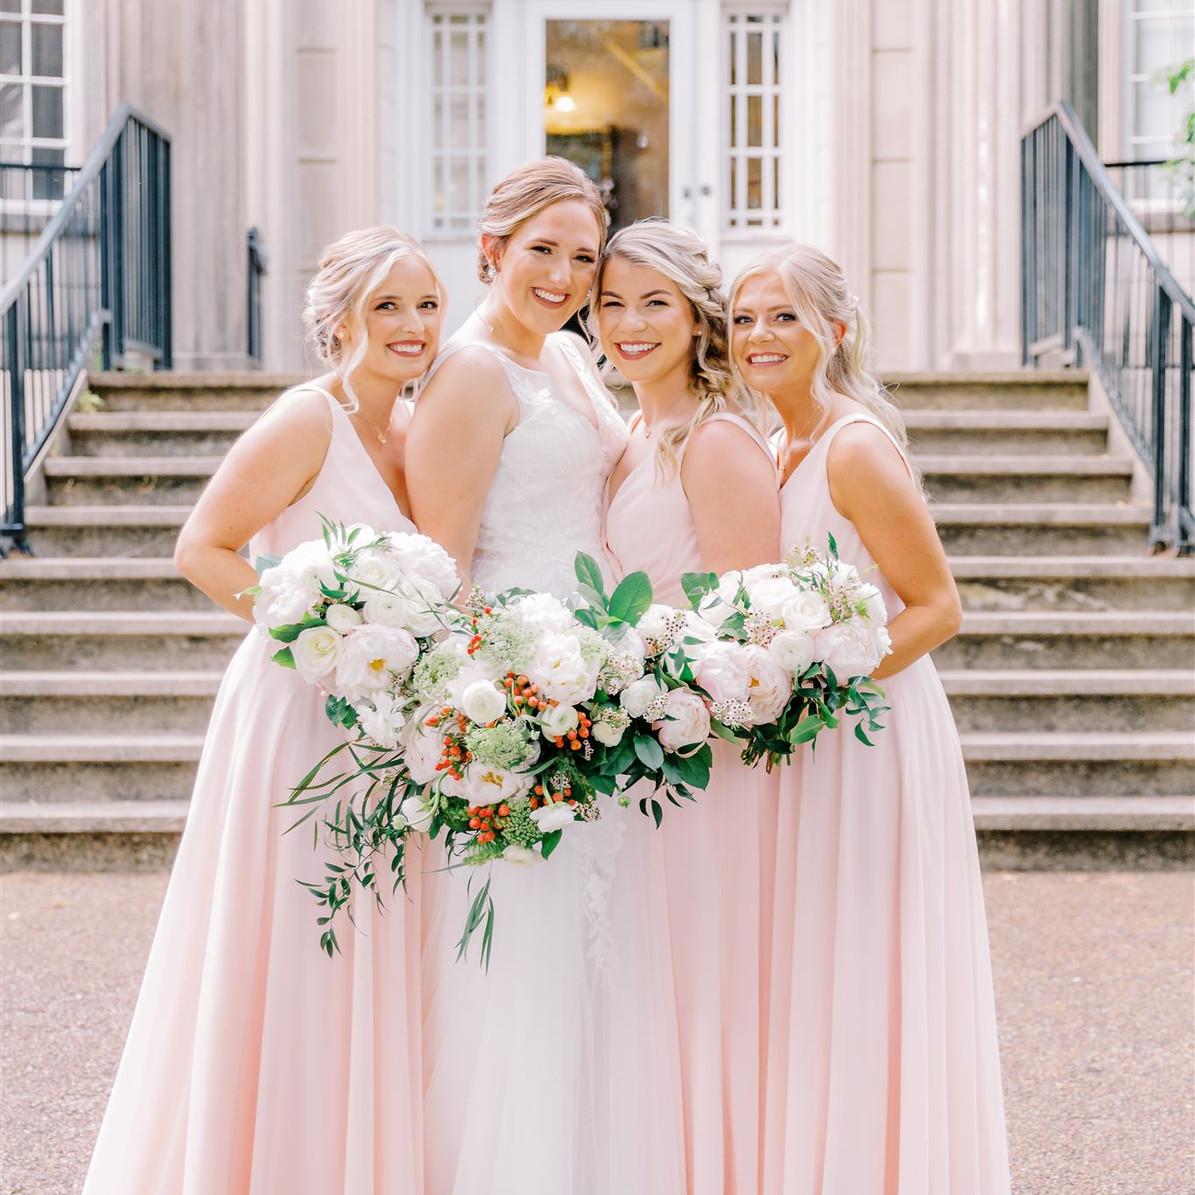 AisPortraits-Kate-Mitch-Wedding-191_websize.jpg